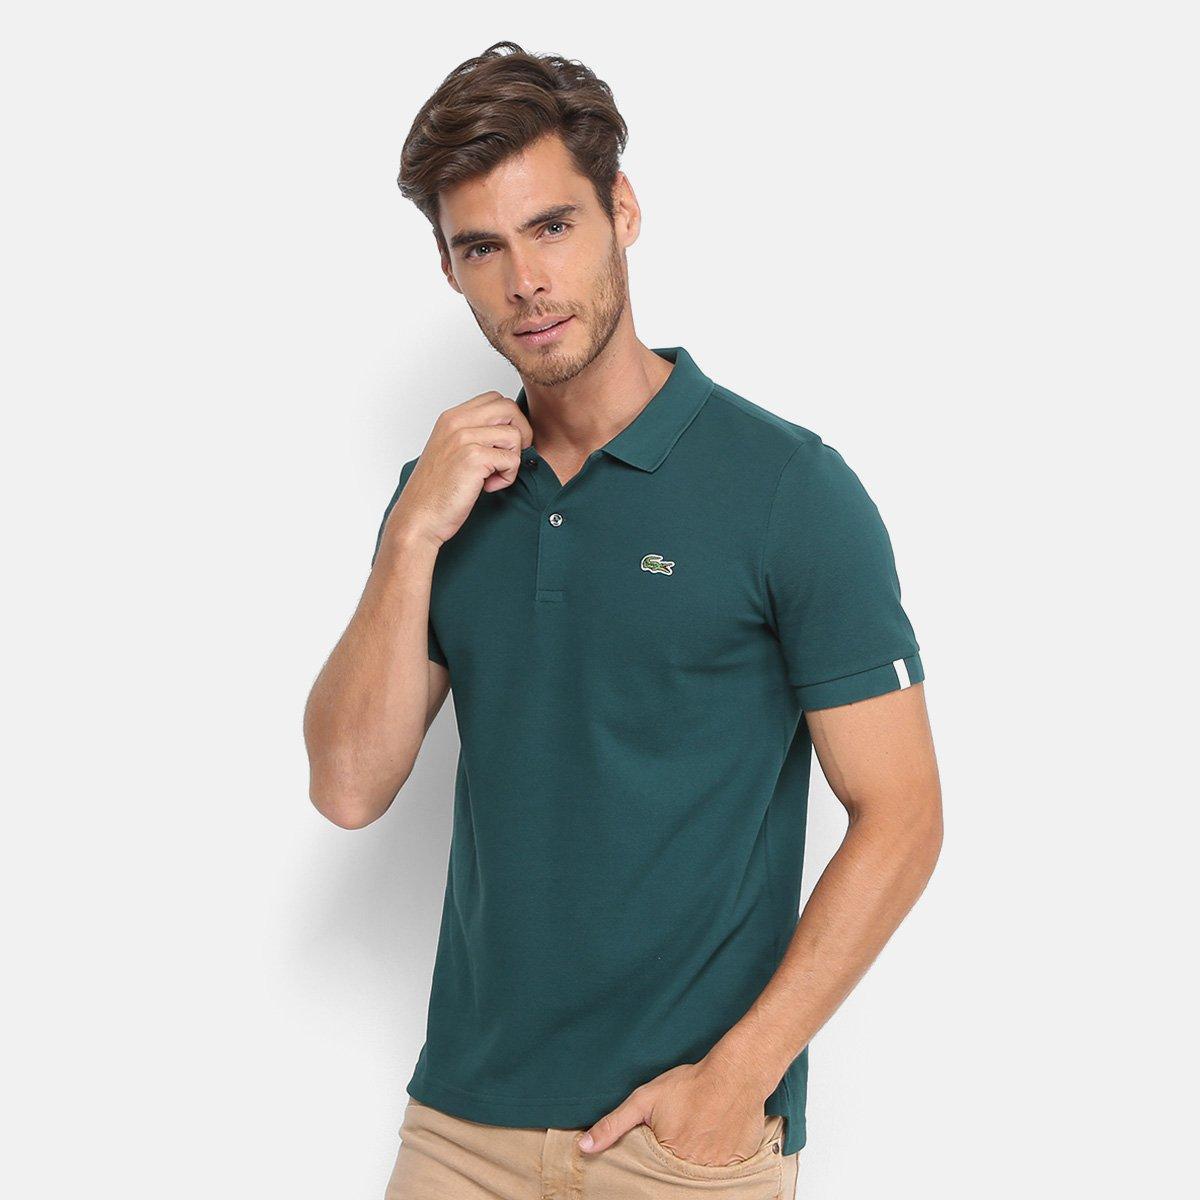 c1f58cf4f3 Camisa Polo Lacoste Live Piquet Masculina - Verde - Compre Agora ...